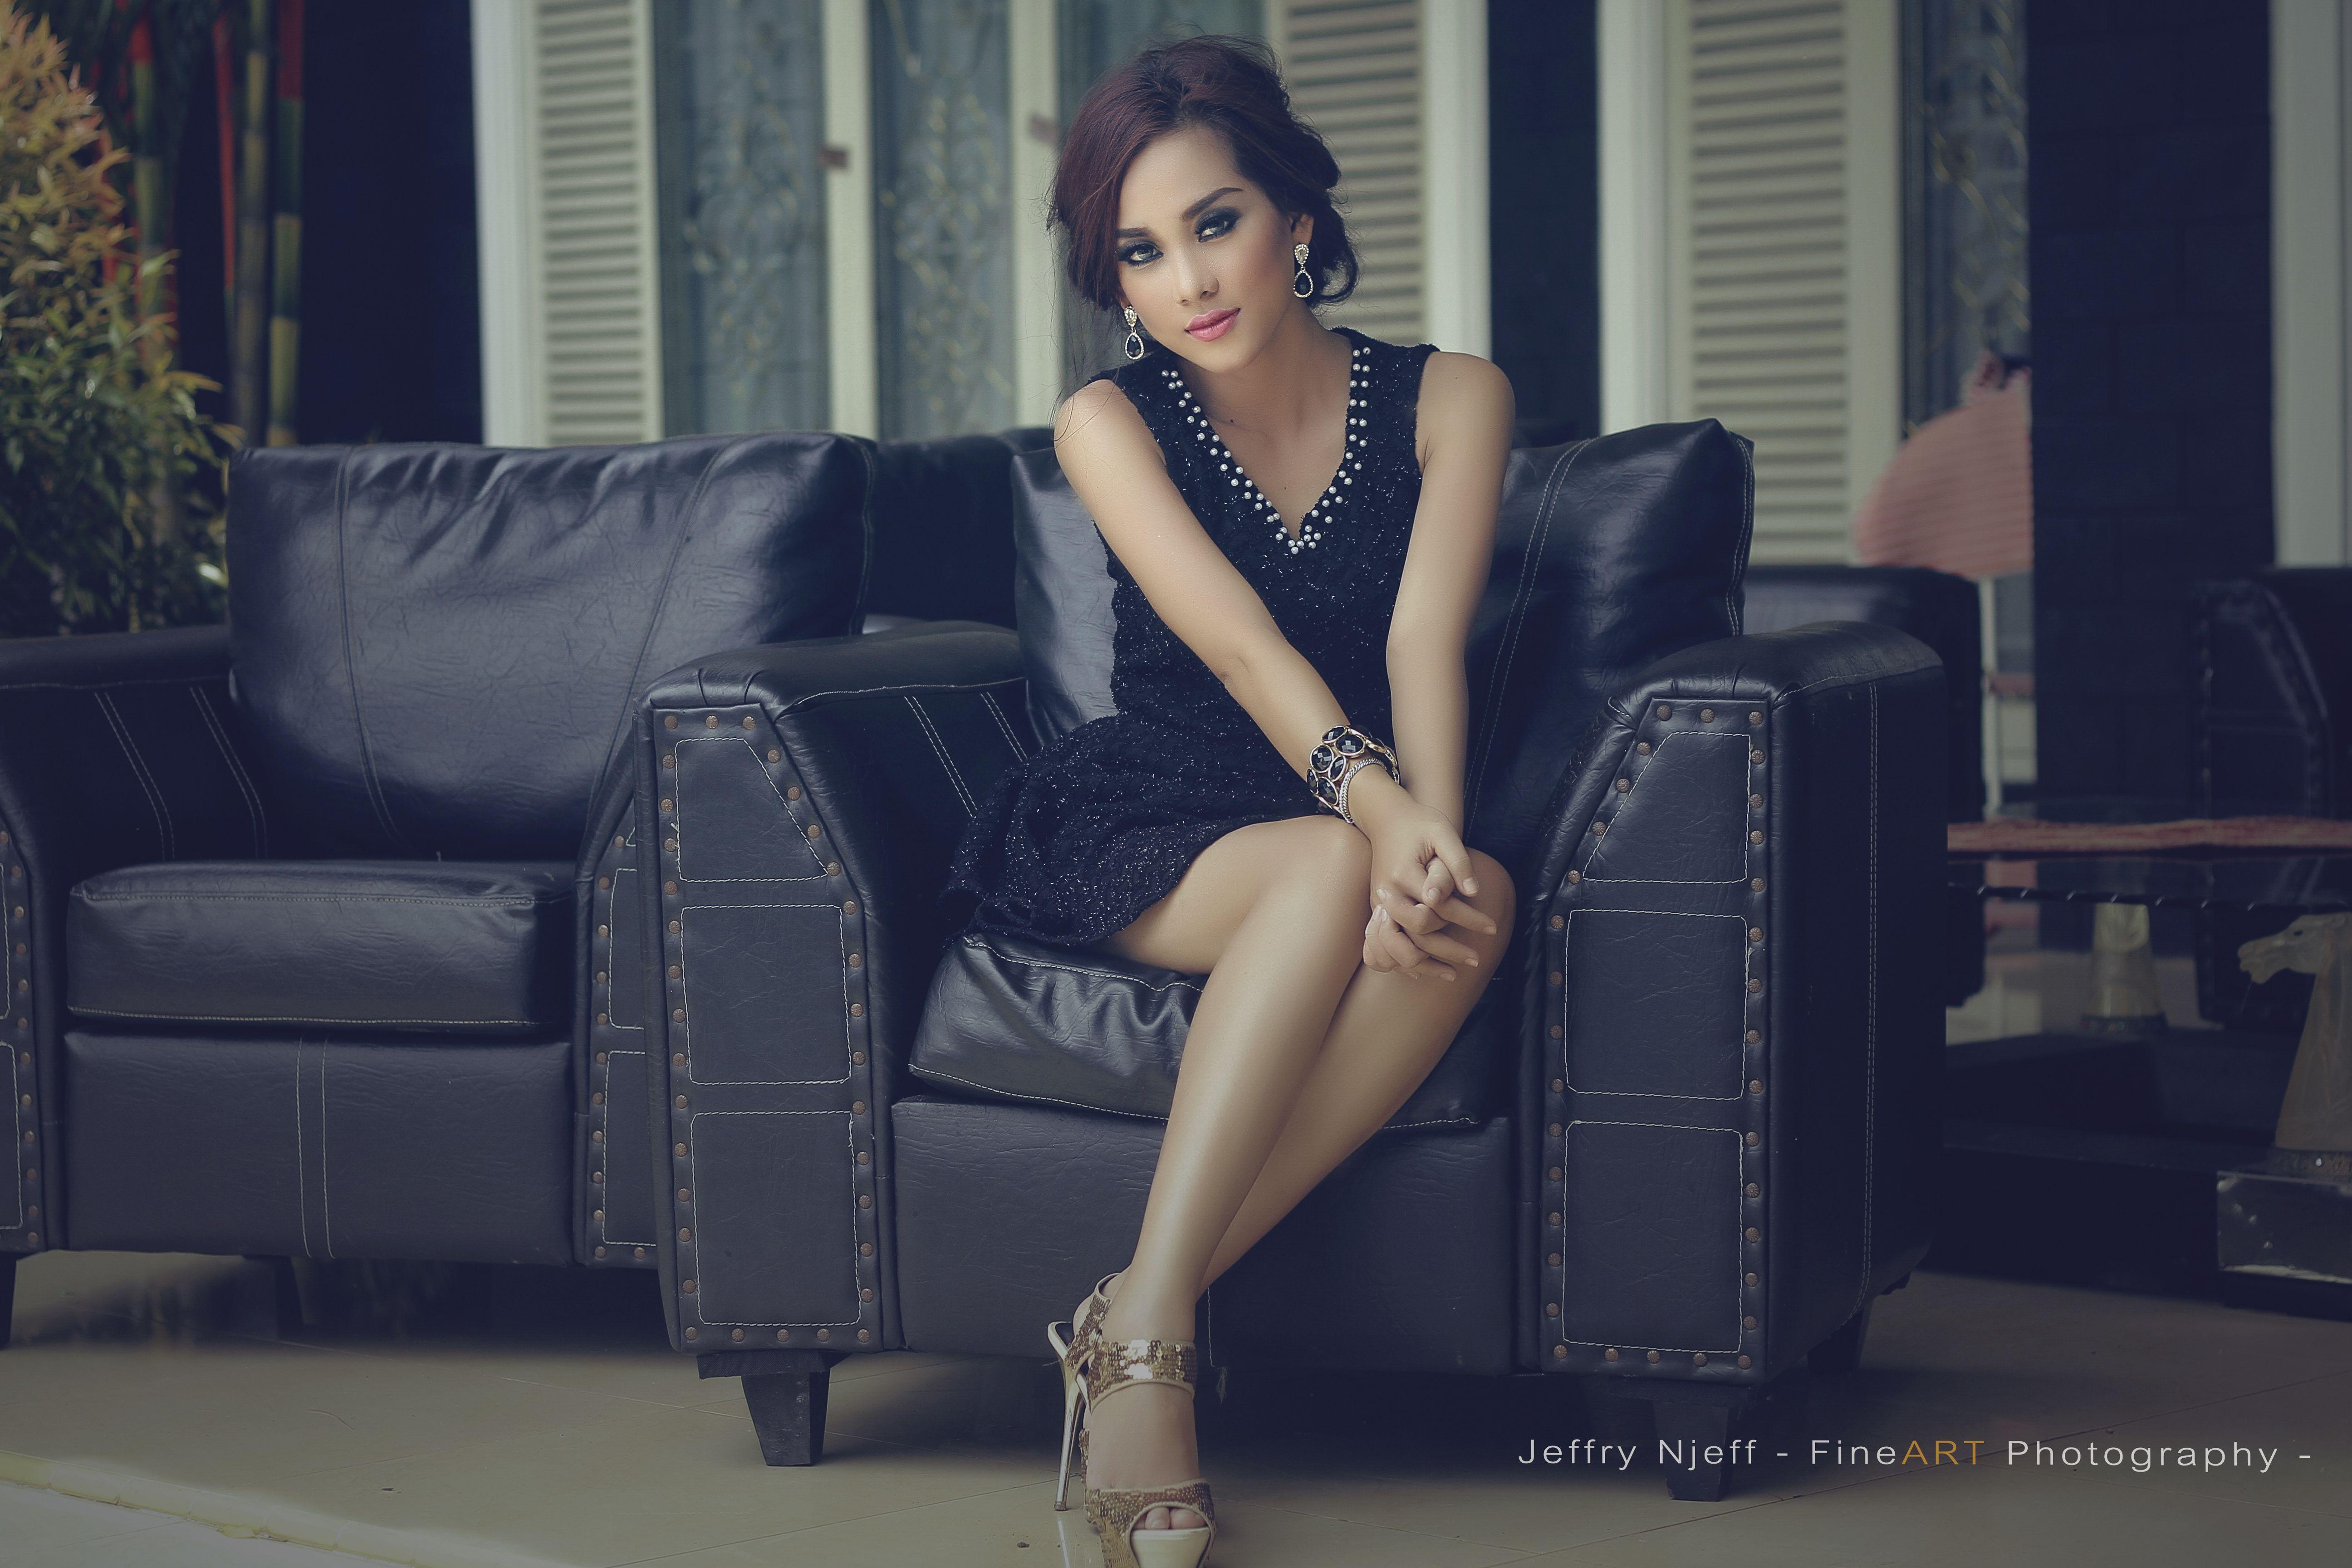 Photography By Jeffry njeff